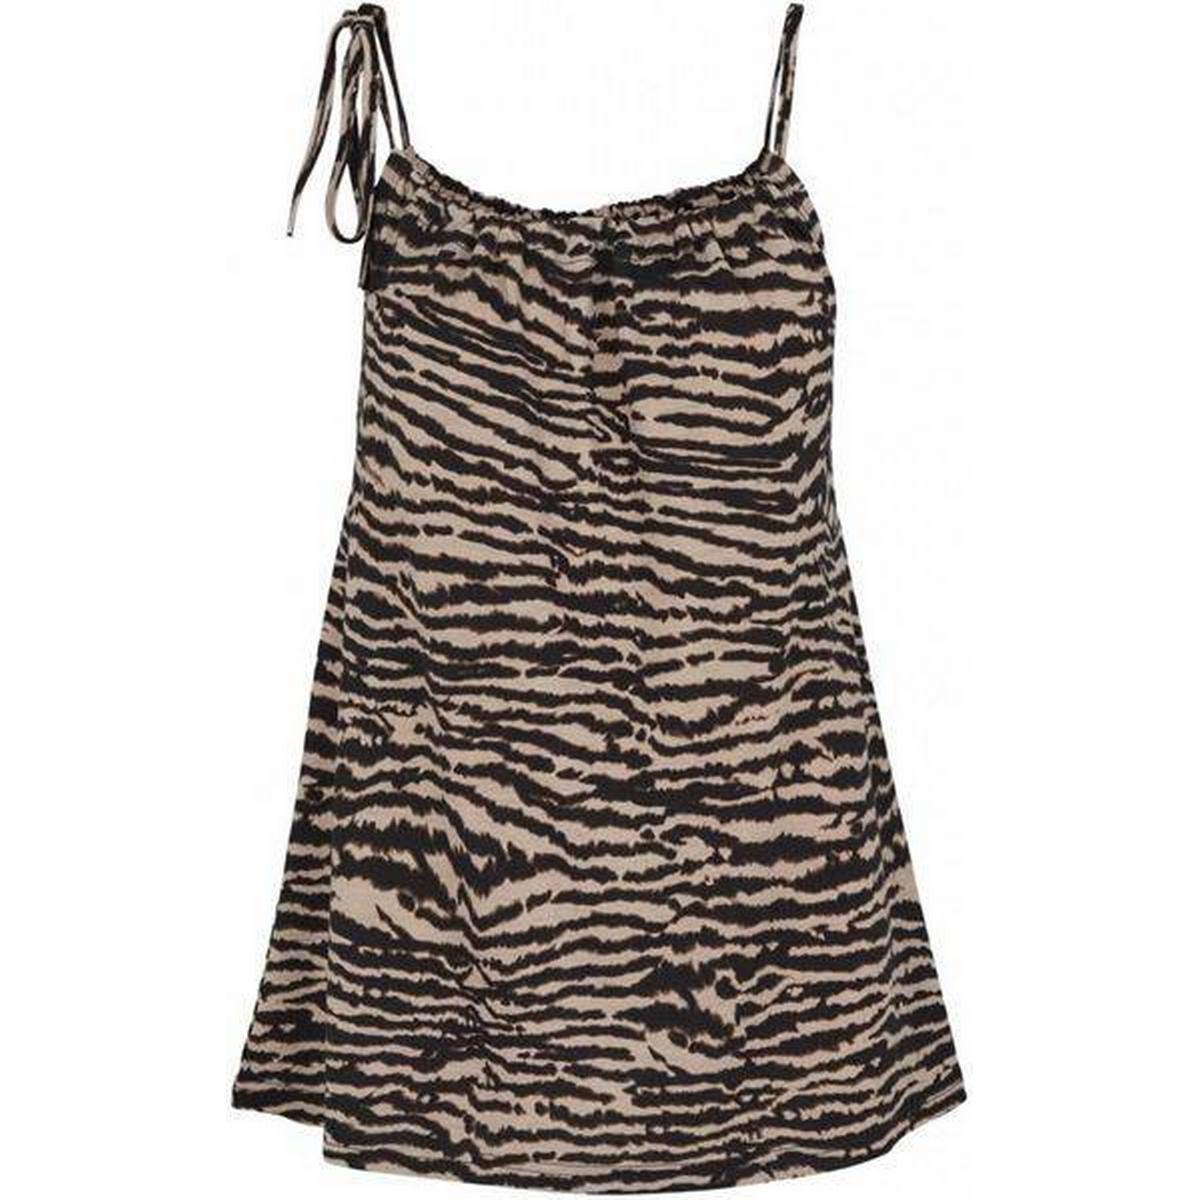 Zebra dametøj Dametøj Sammenlign priser hos PriceRunner